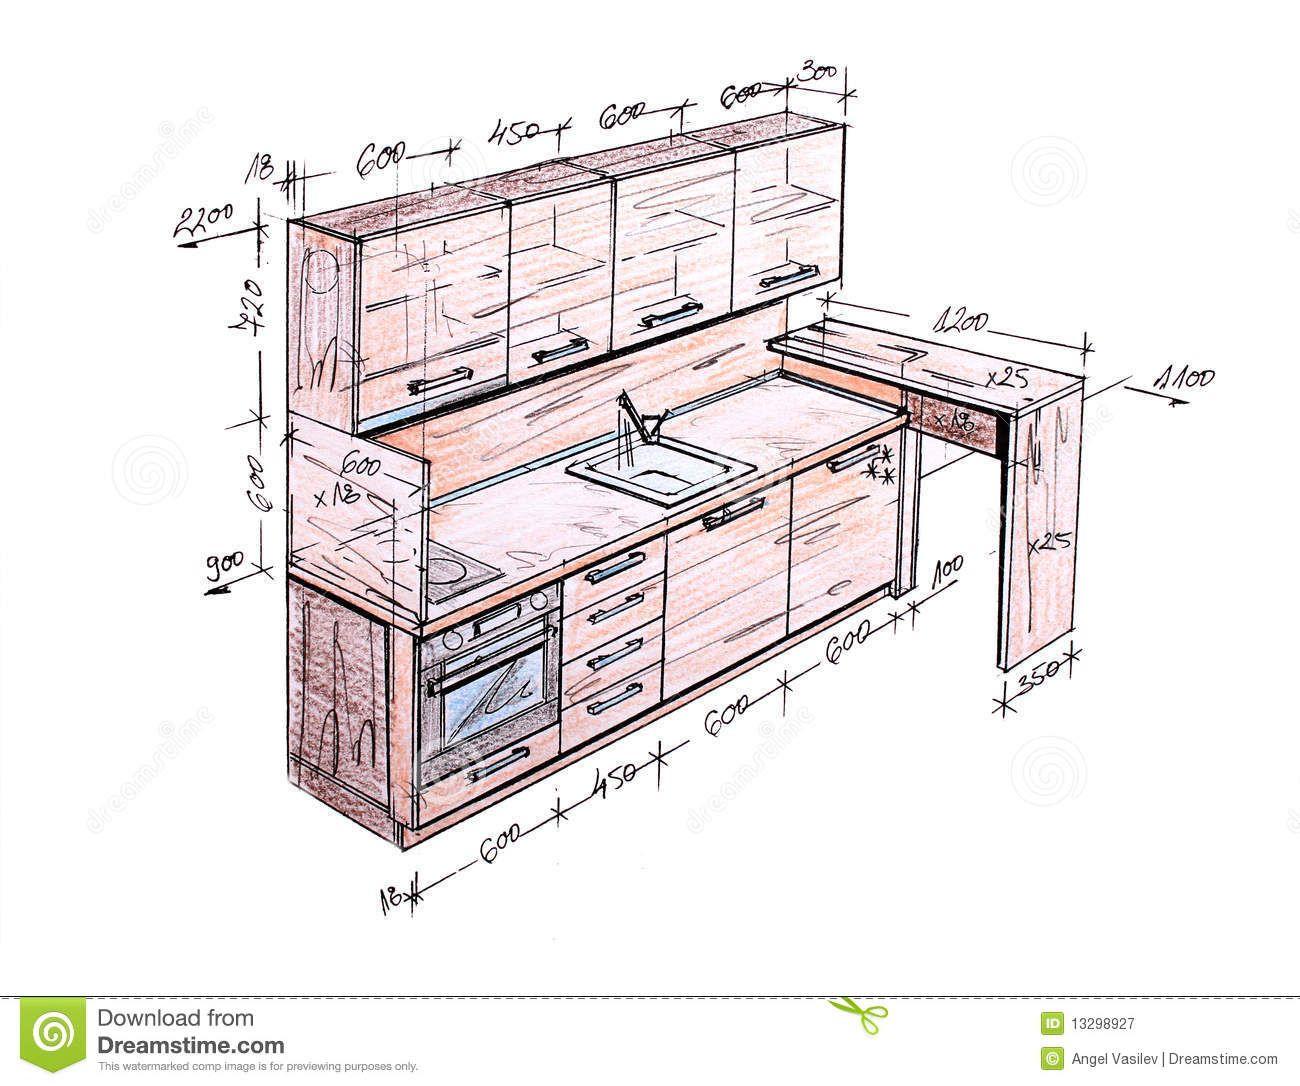 Modern Furniture Drawings dining room dibujo - buscar con google | diseños muebles de hogar